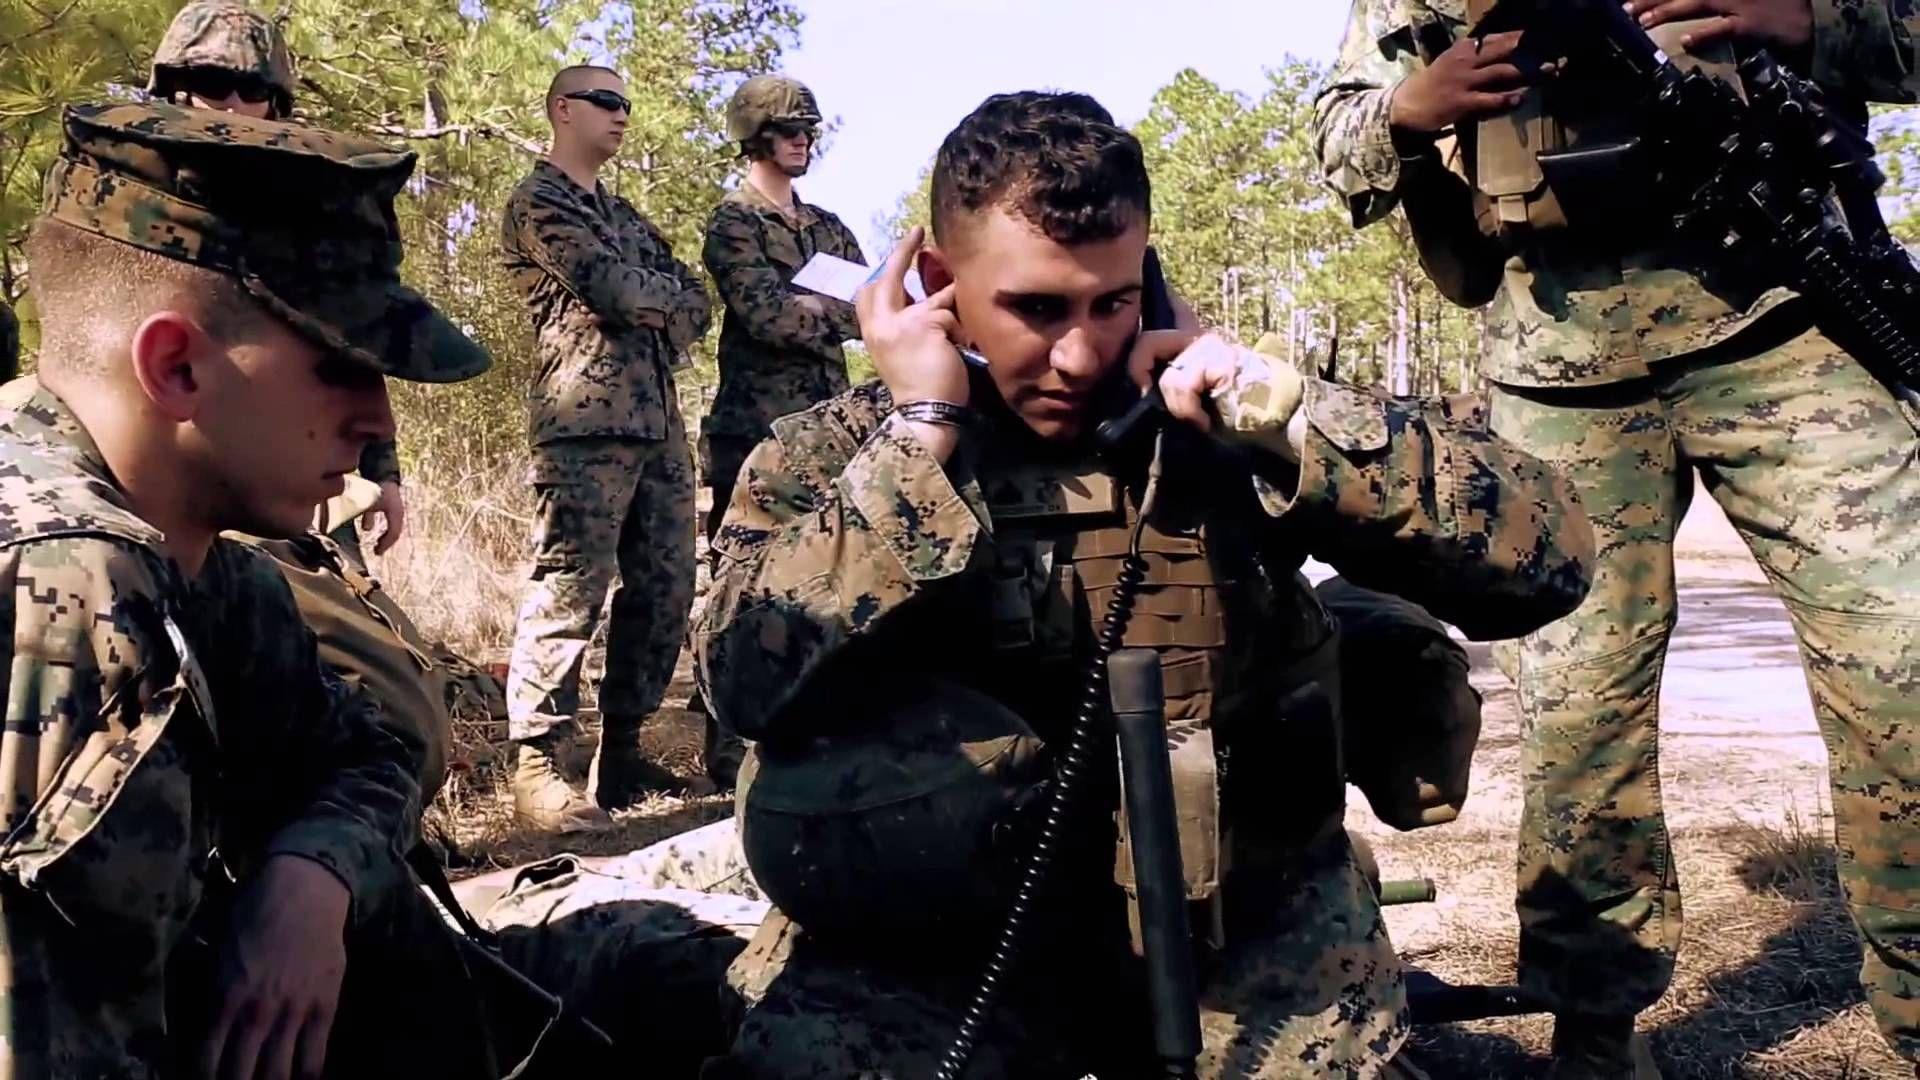 Pin On Usmc Us Troops Videos